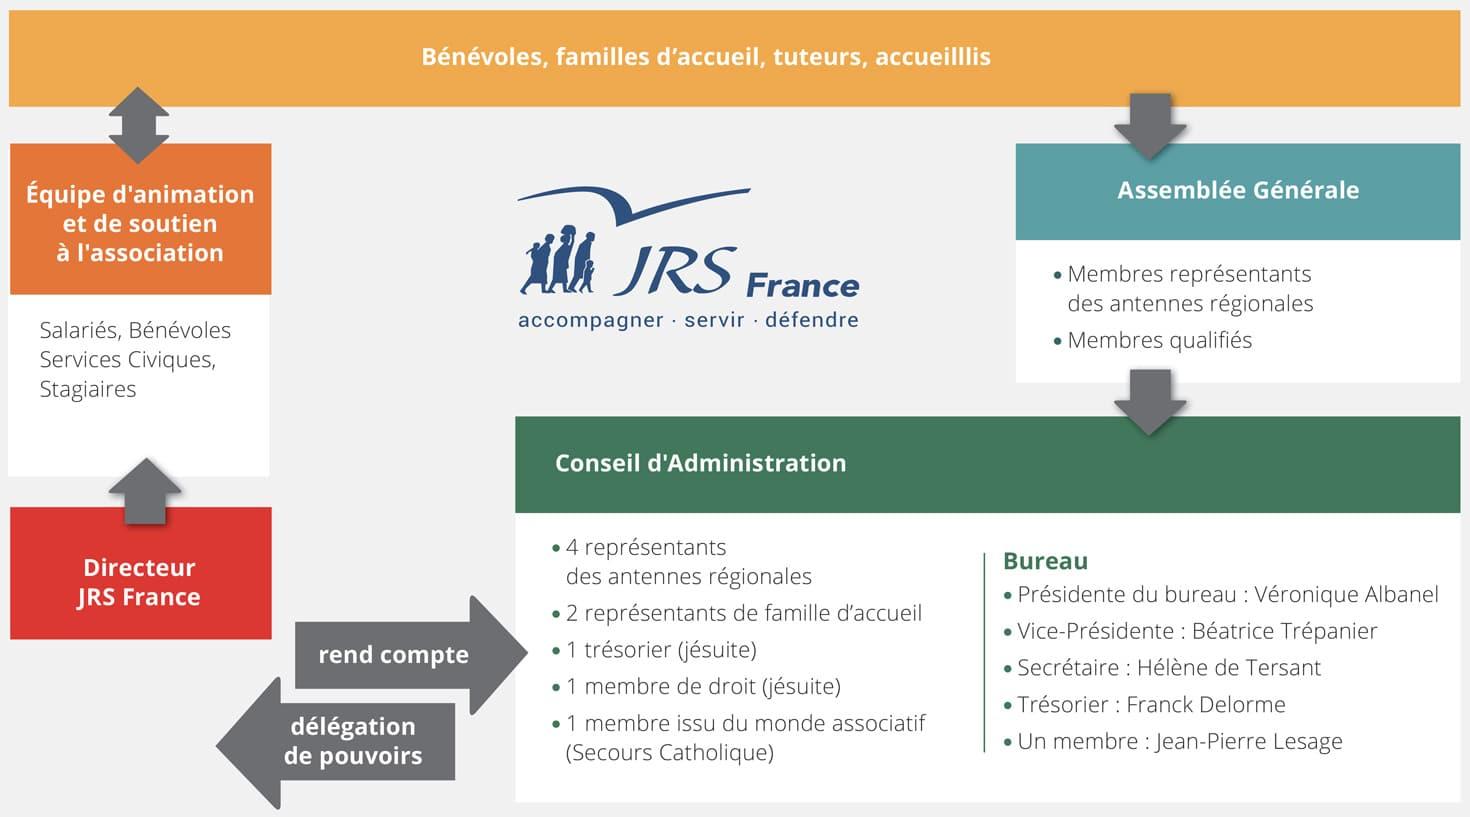 Organisation JRS